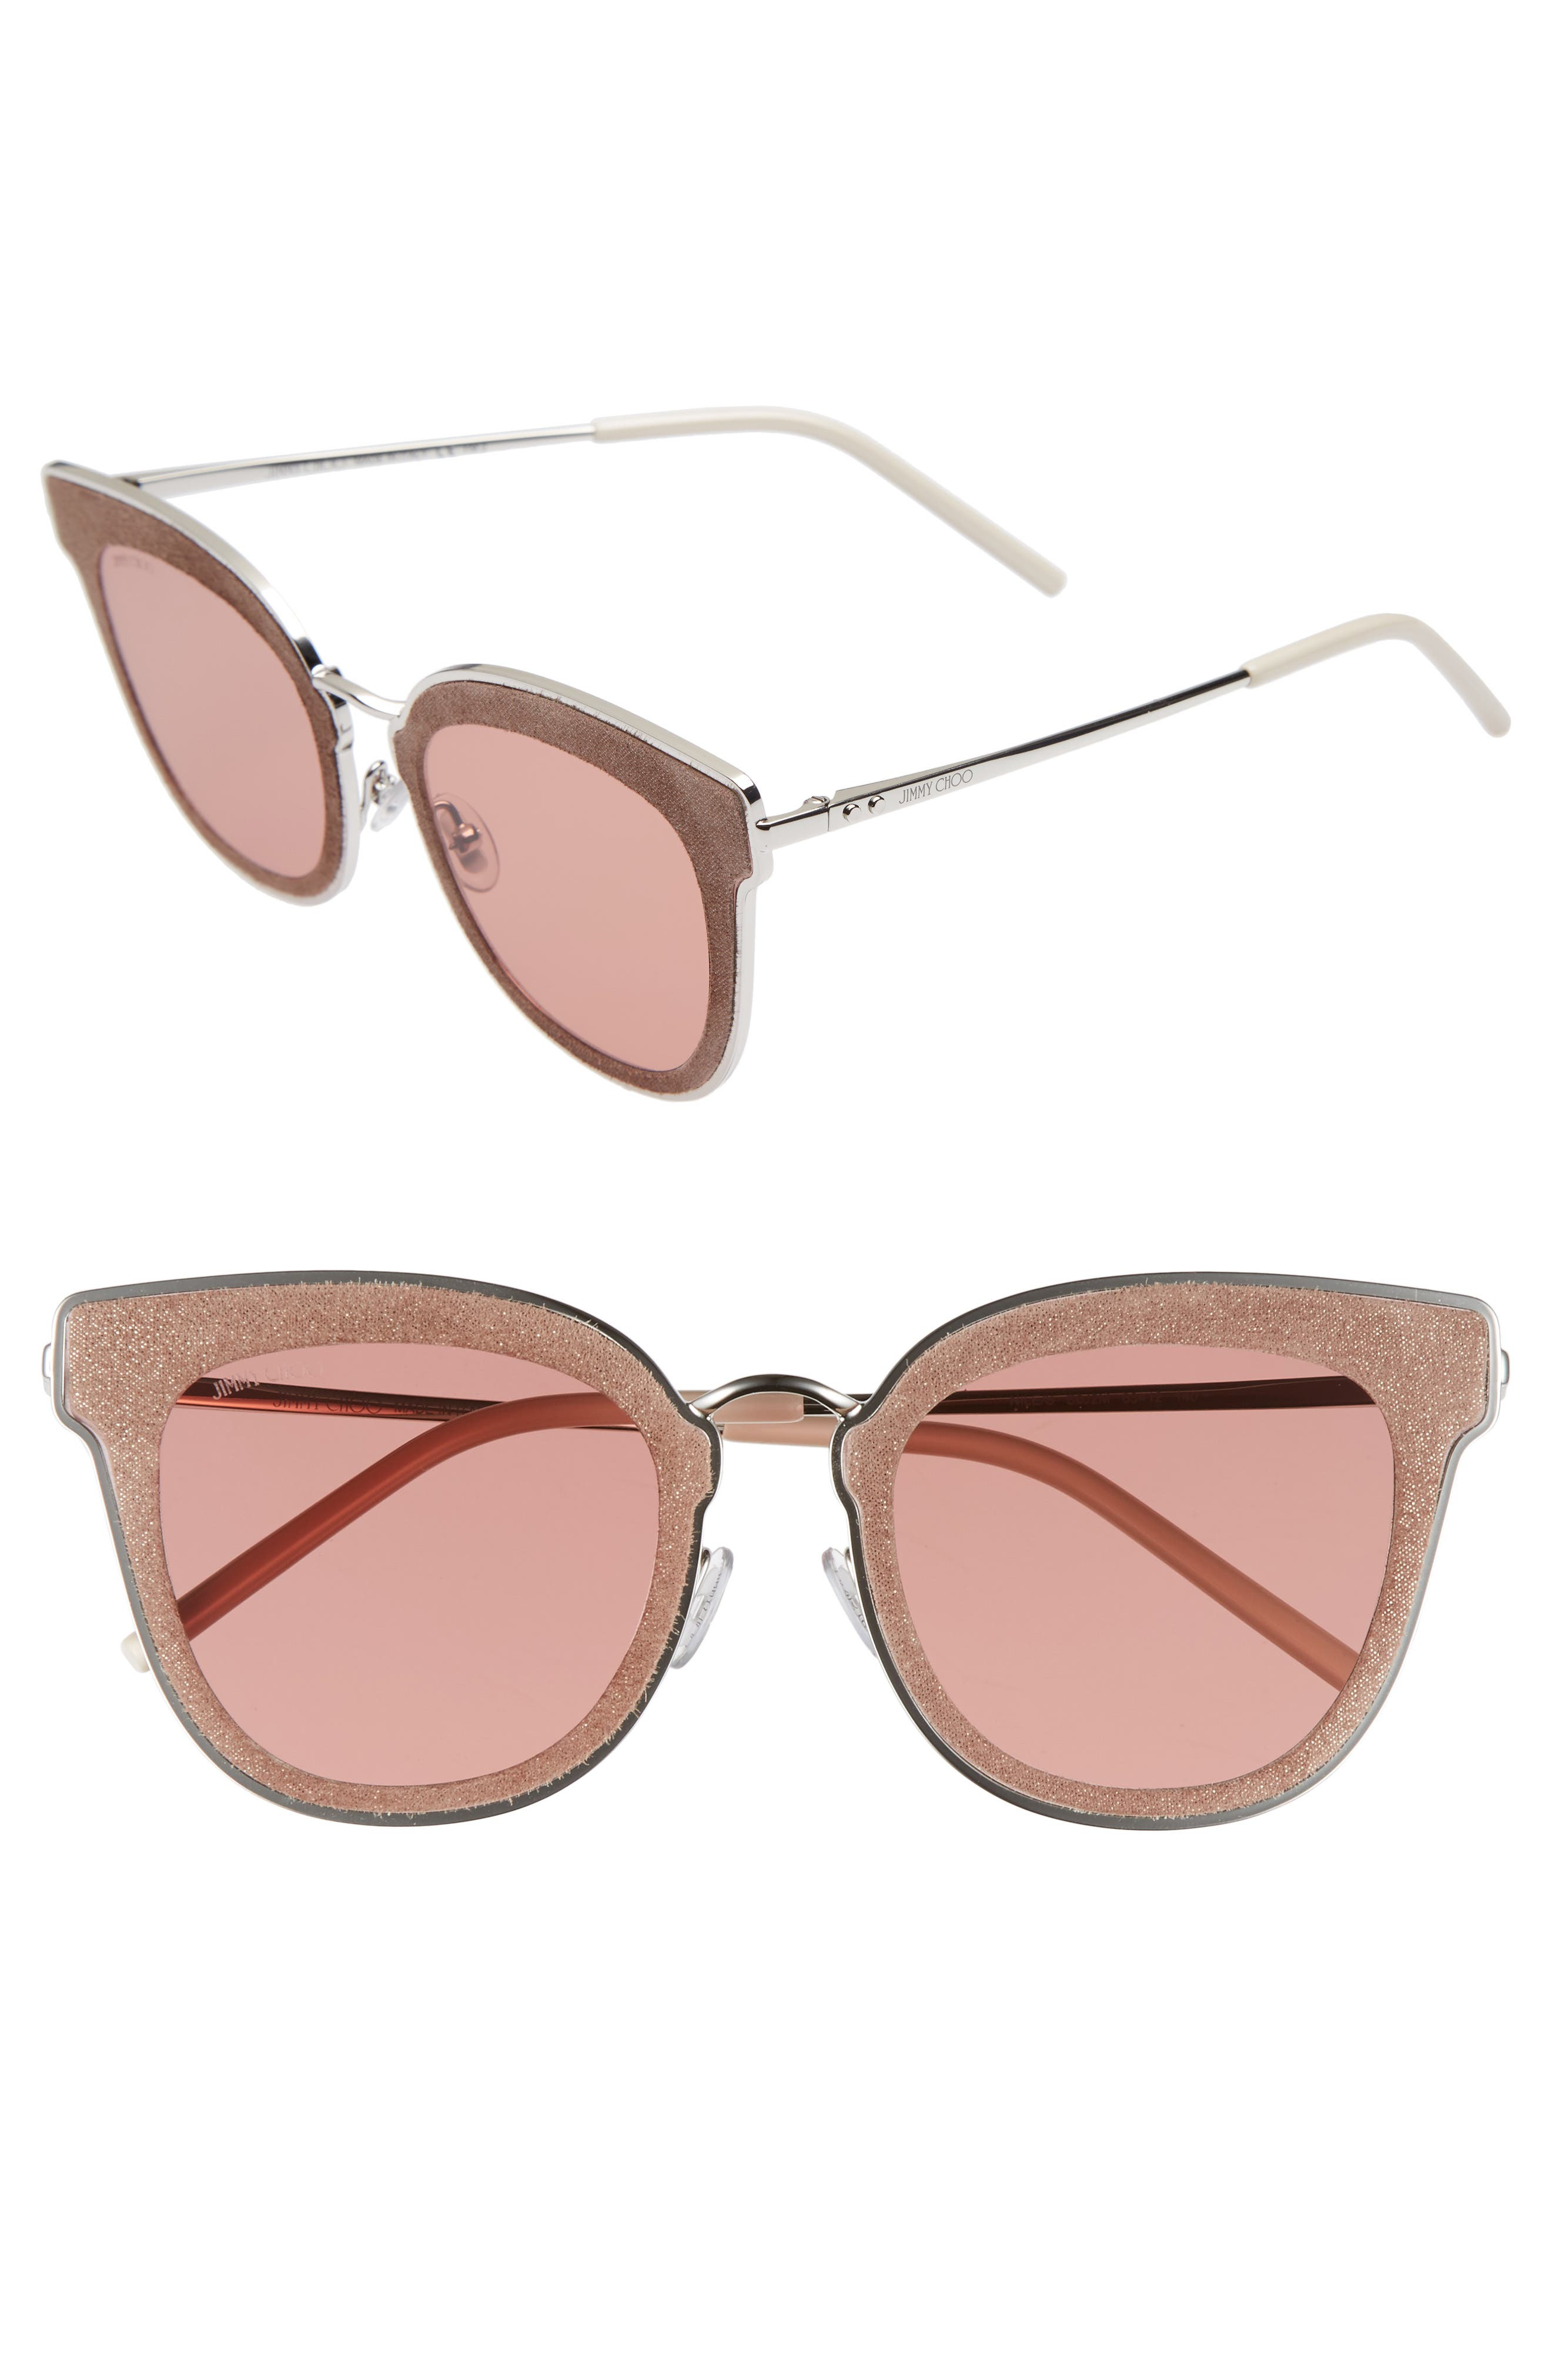 Niles 63mm Oversize Cat Eye Sunglasses,                             Main thumbnail 1, color,                             Silver Beige